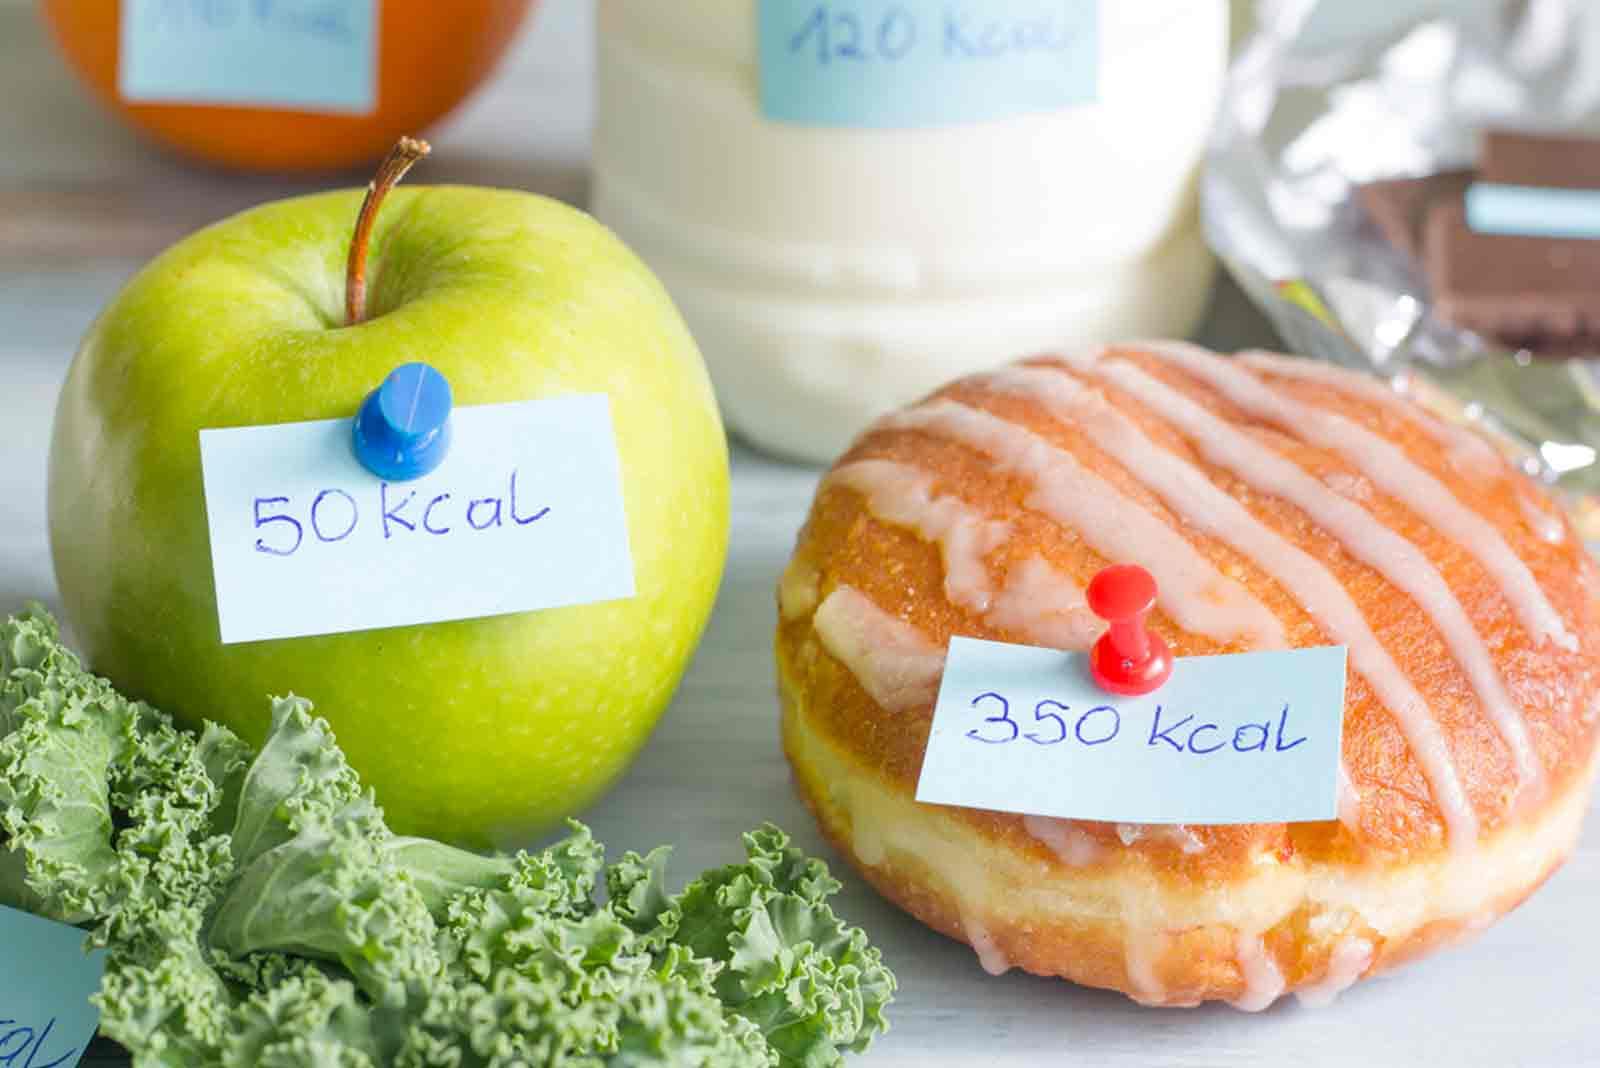 Decidere le calorie